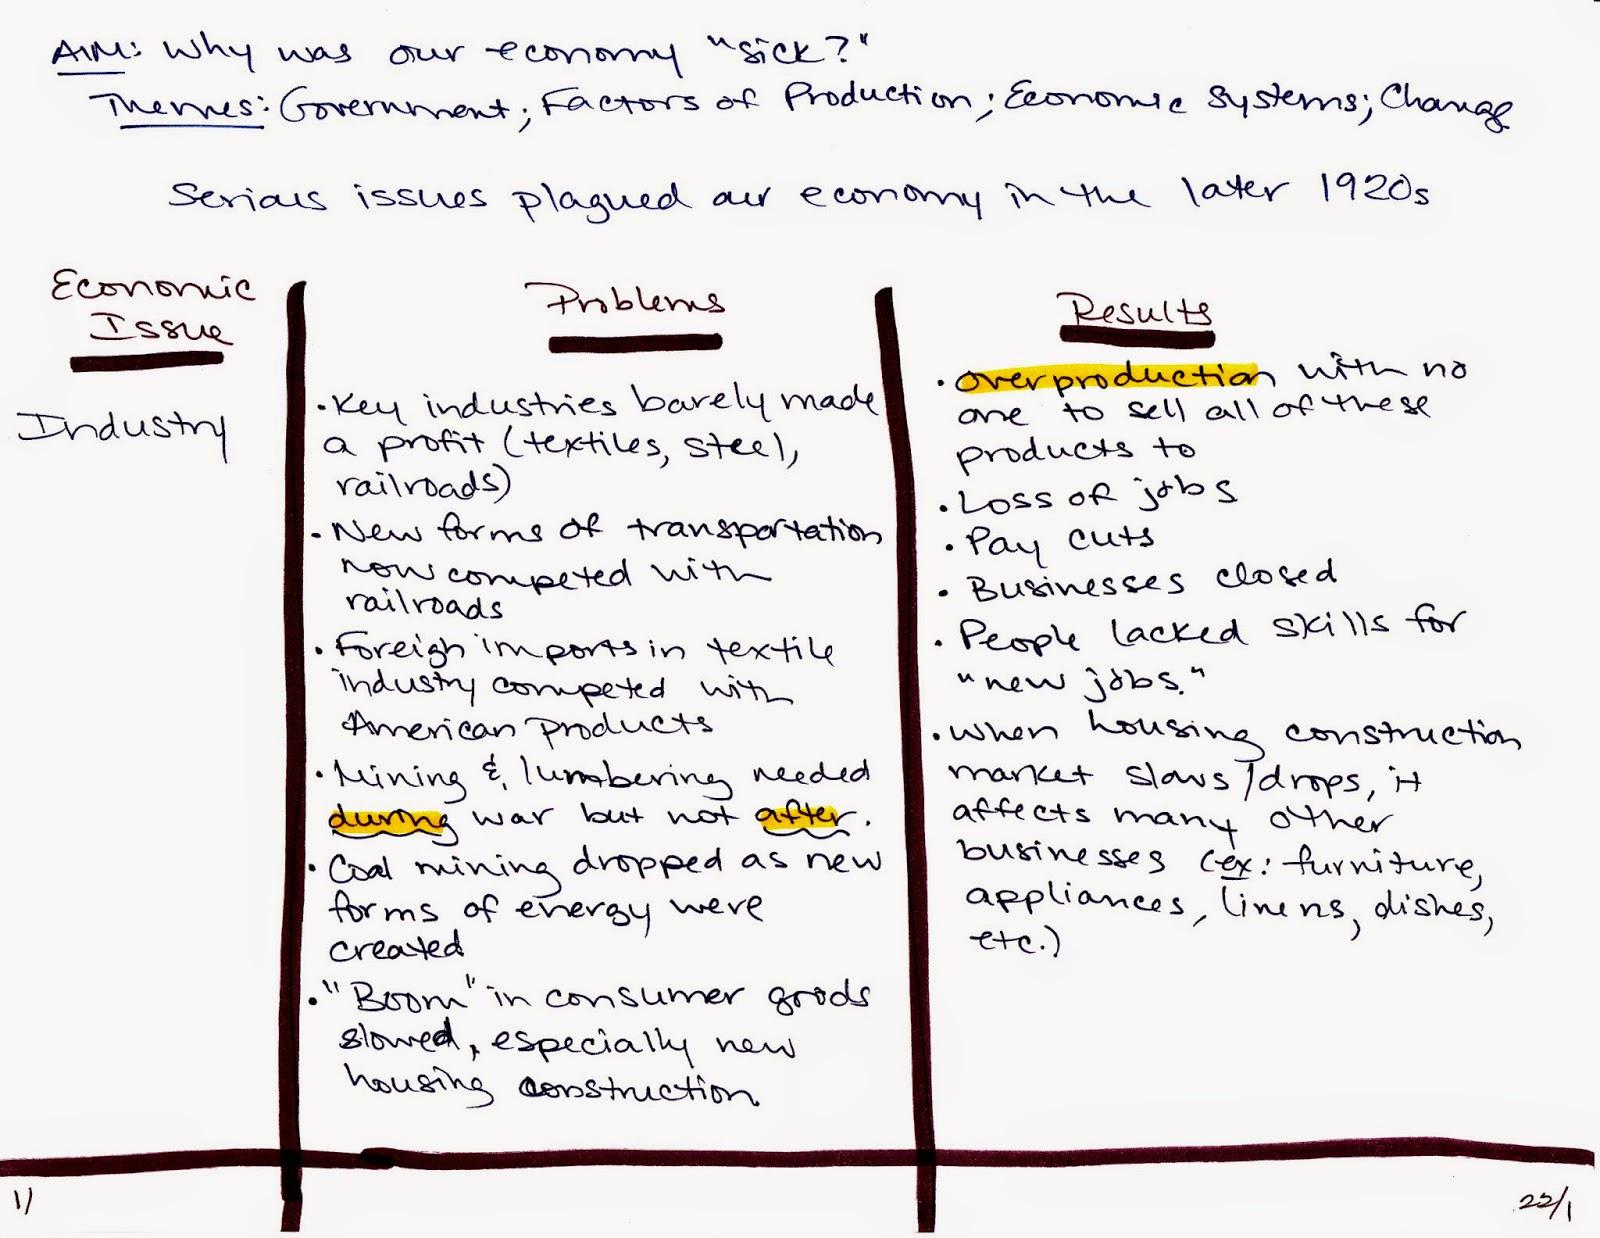 u s history chapter 22 notes Study notes, llc, 17 nov 2012 web 05 sep 2018.